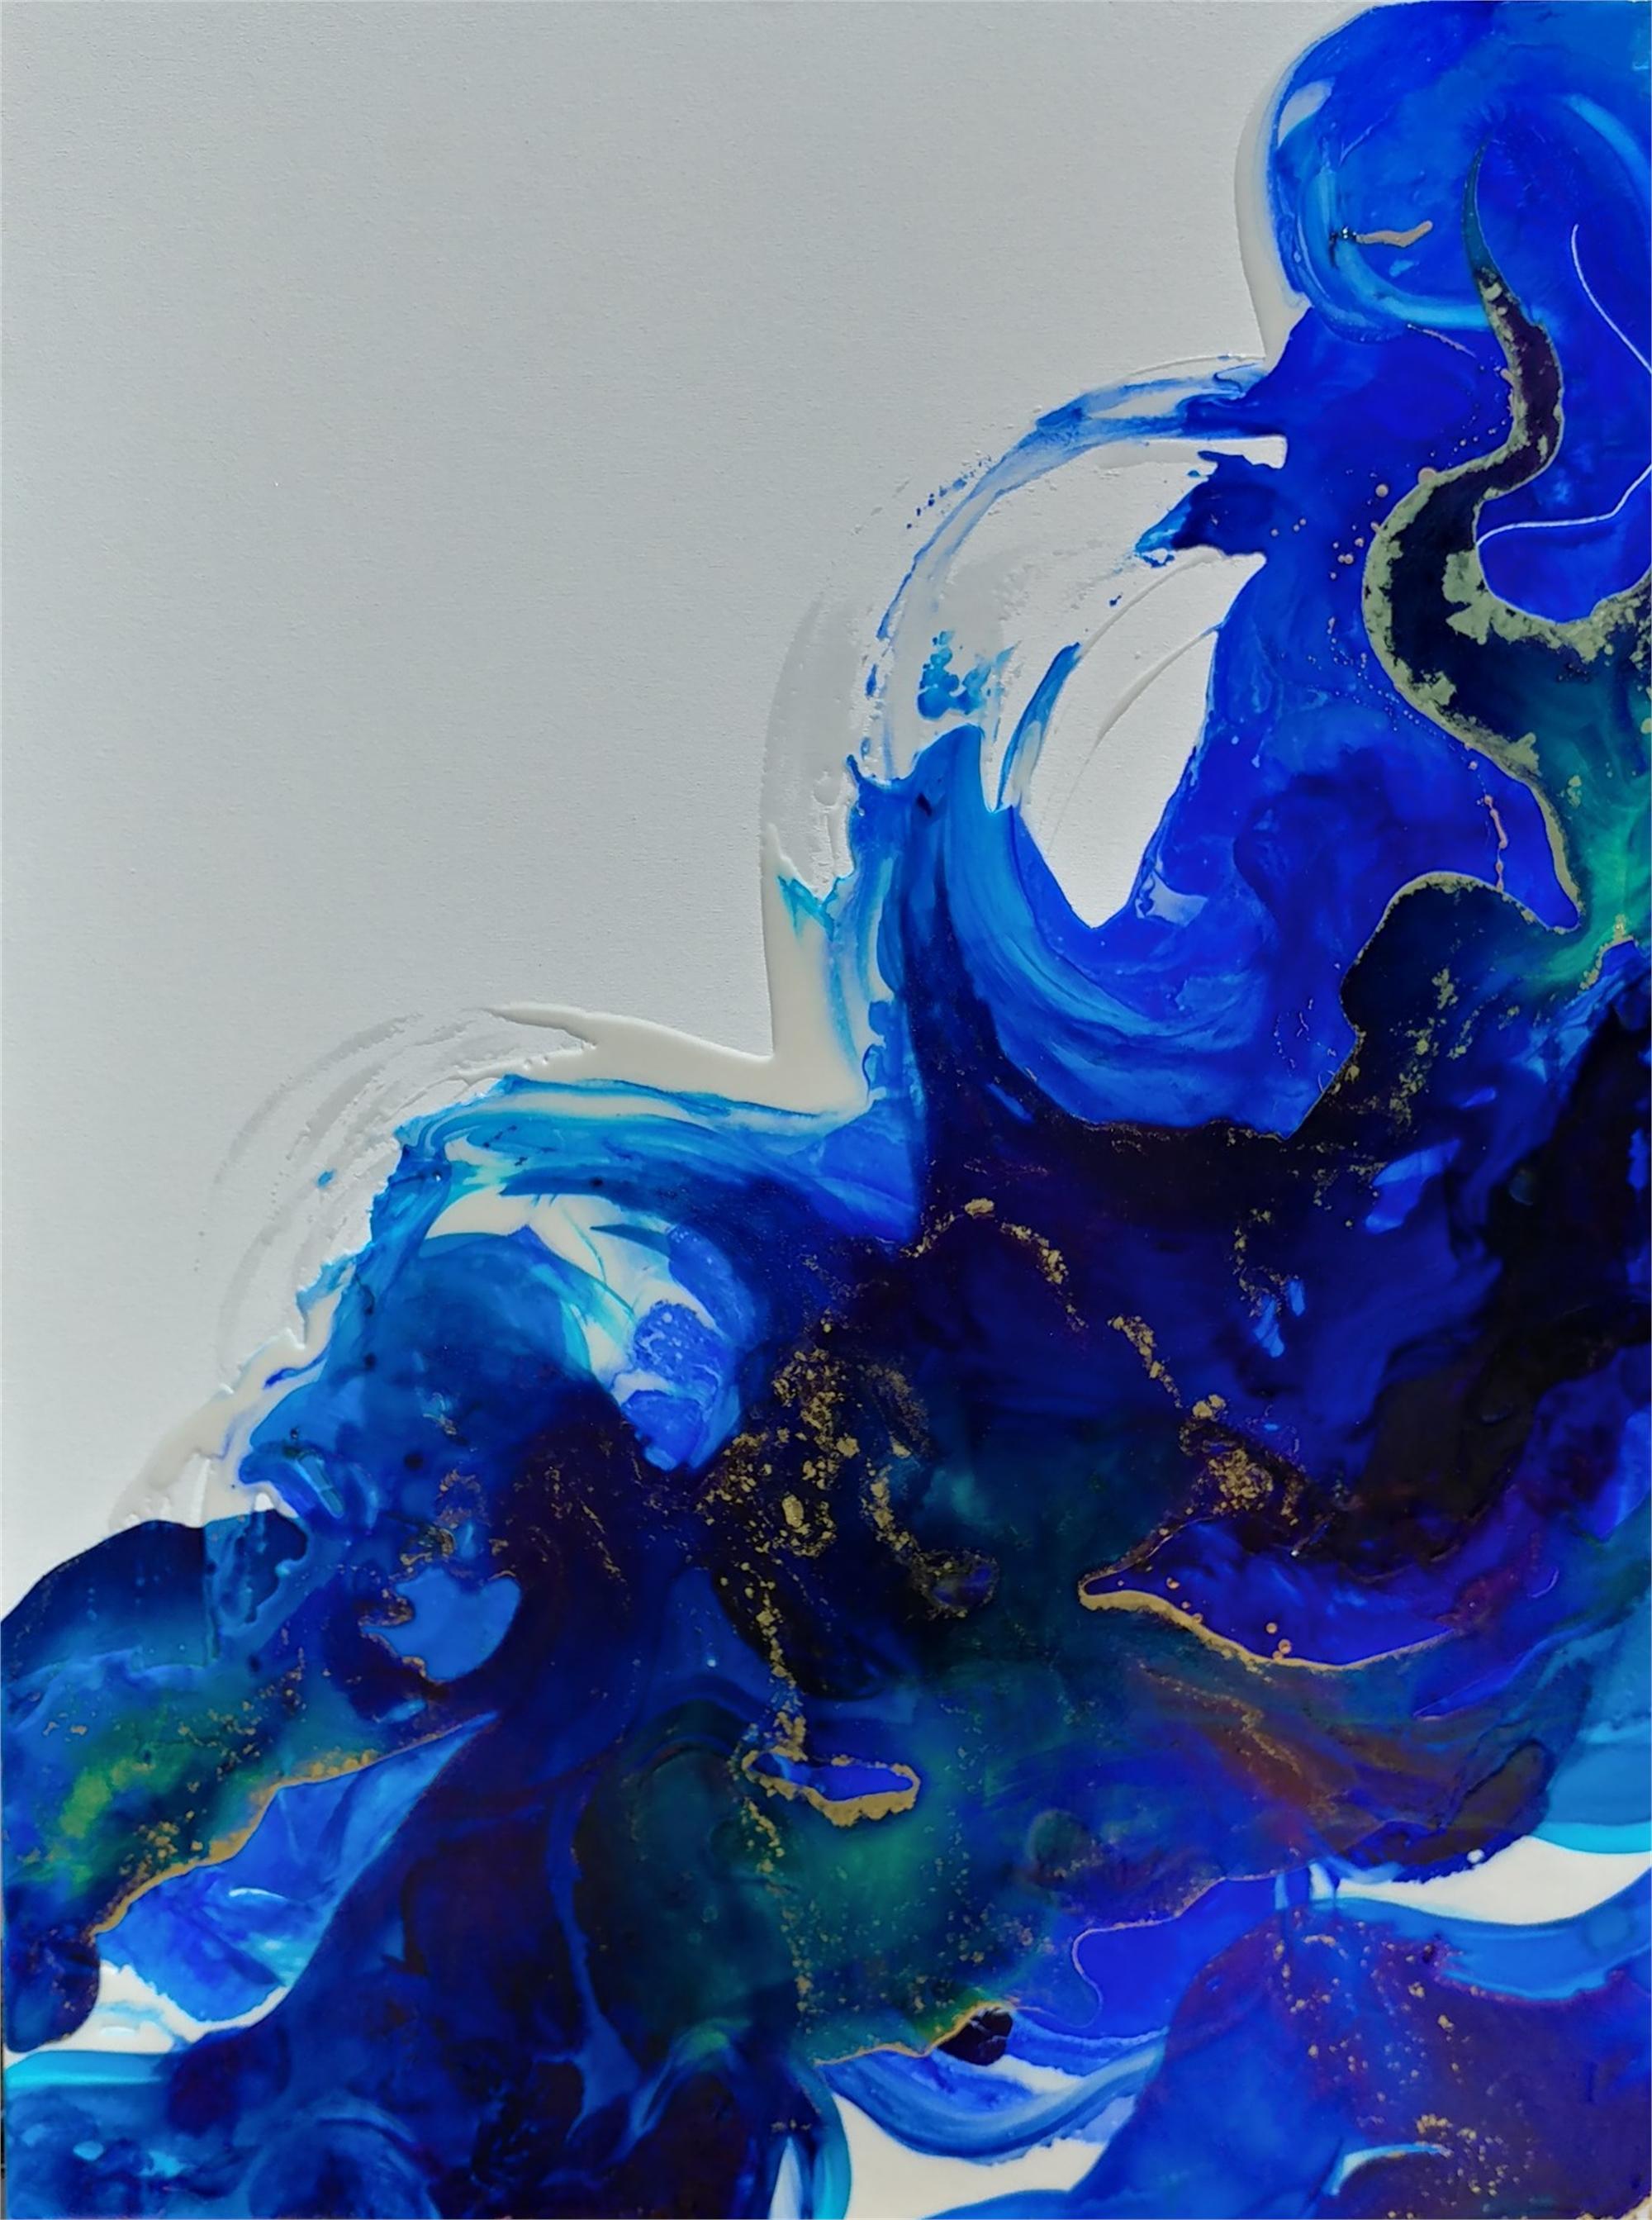 Oceanus No. 4 by Lisa Ledson